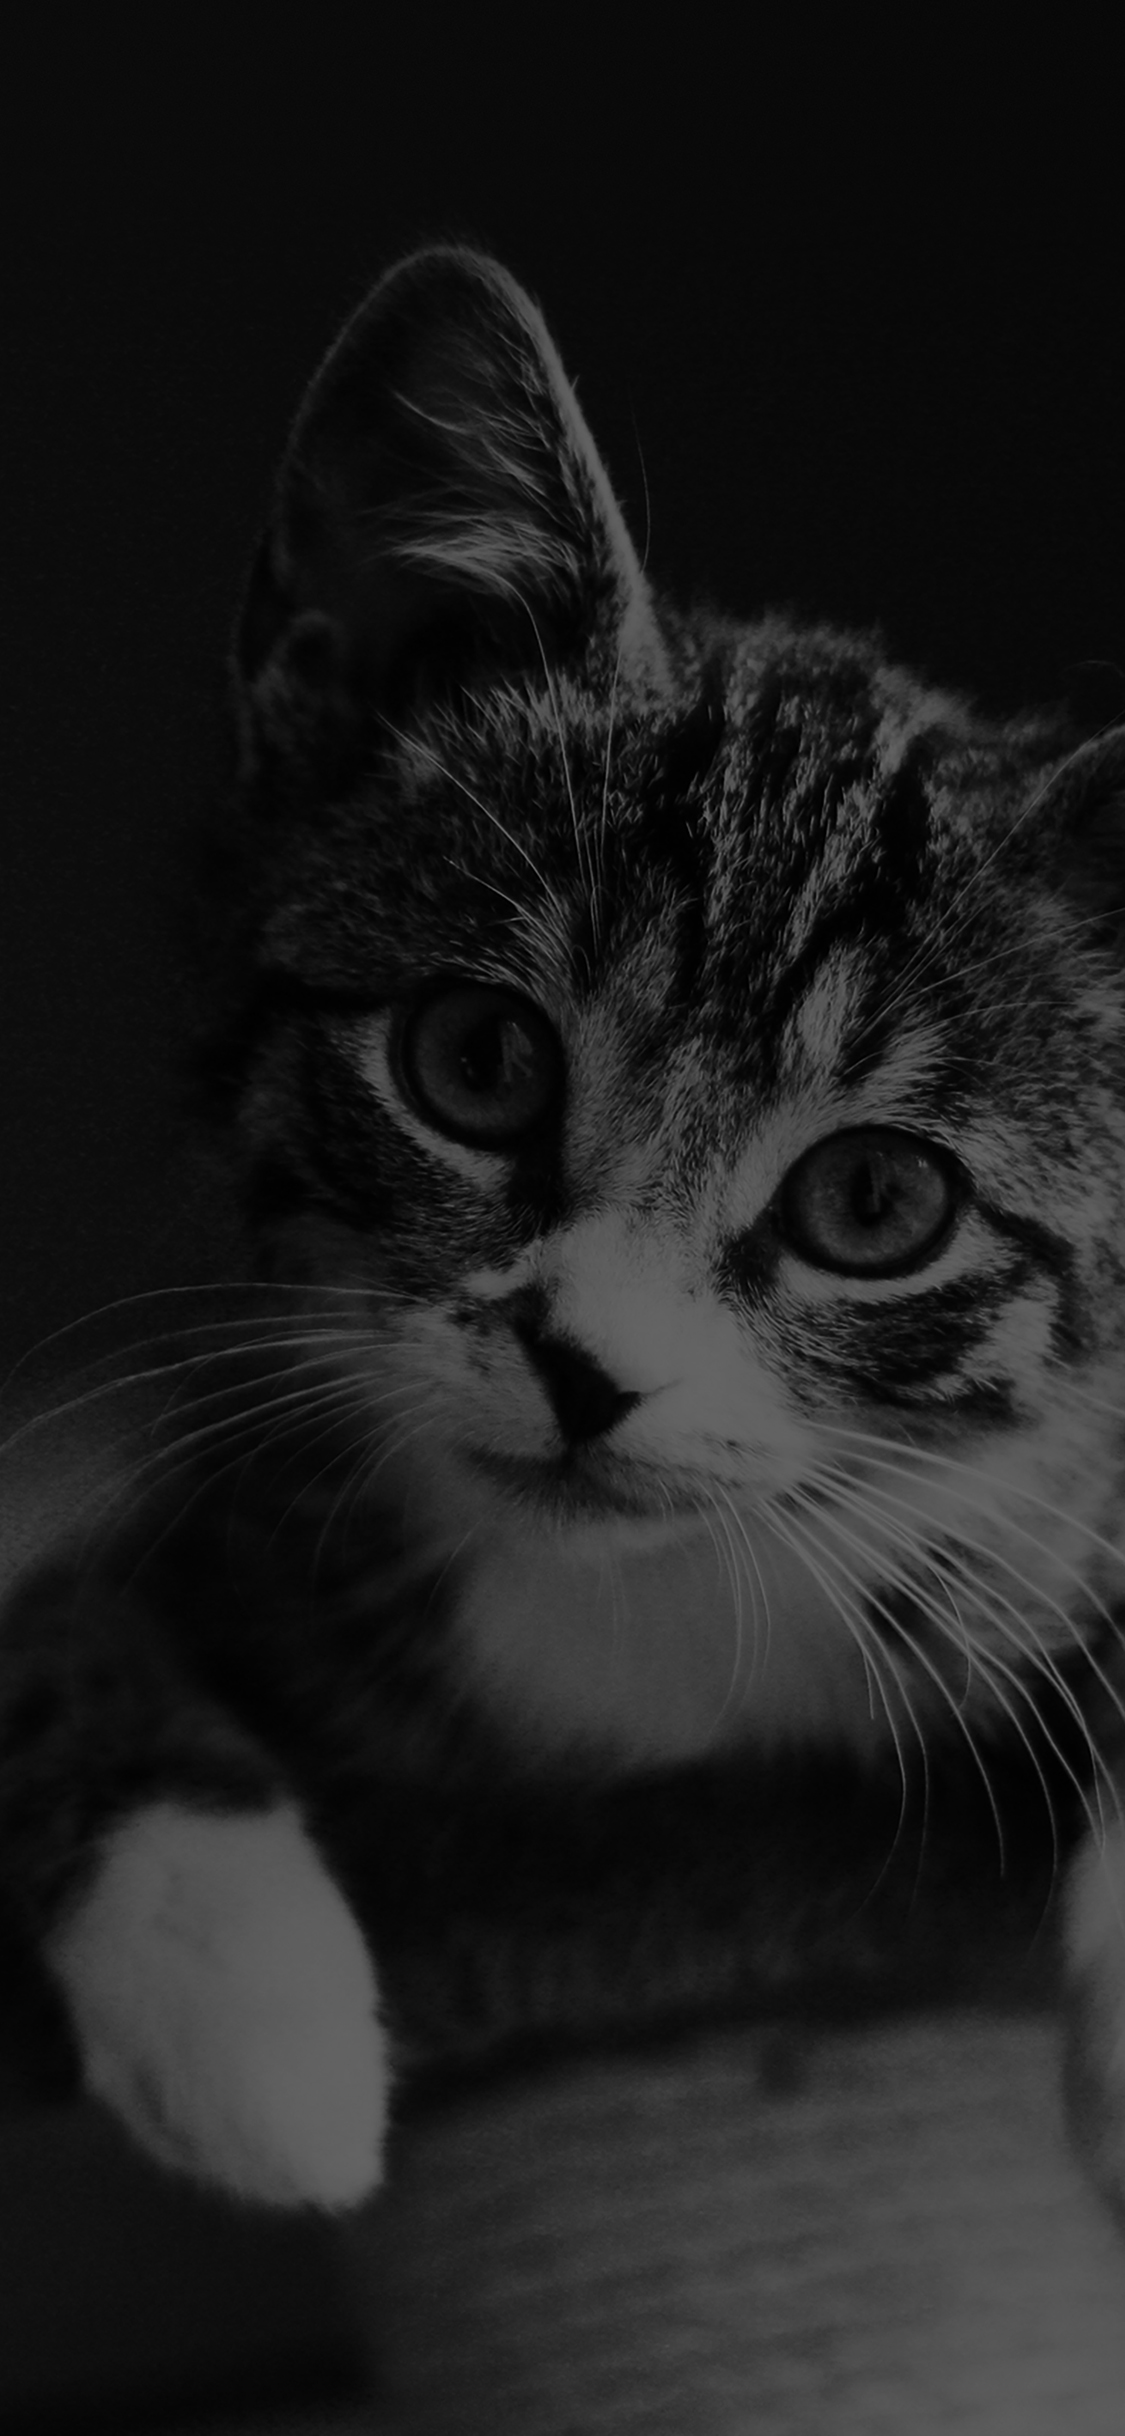 Batman Hd Wallpapers 1080p Mi36 Cute Cat Look Dark Bw Animal Love Nature Wallpaper